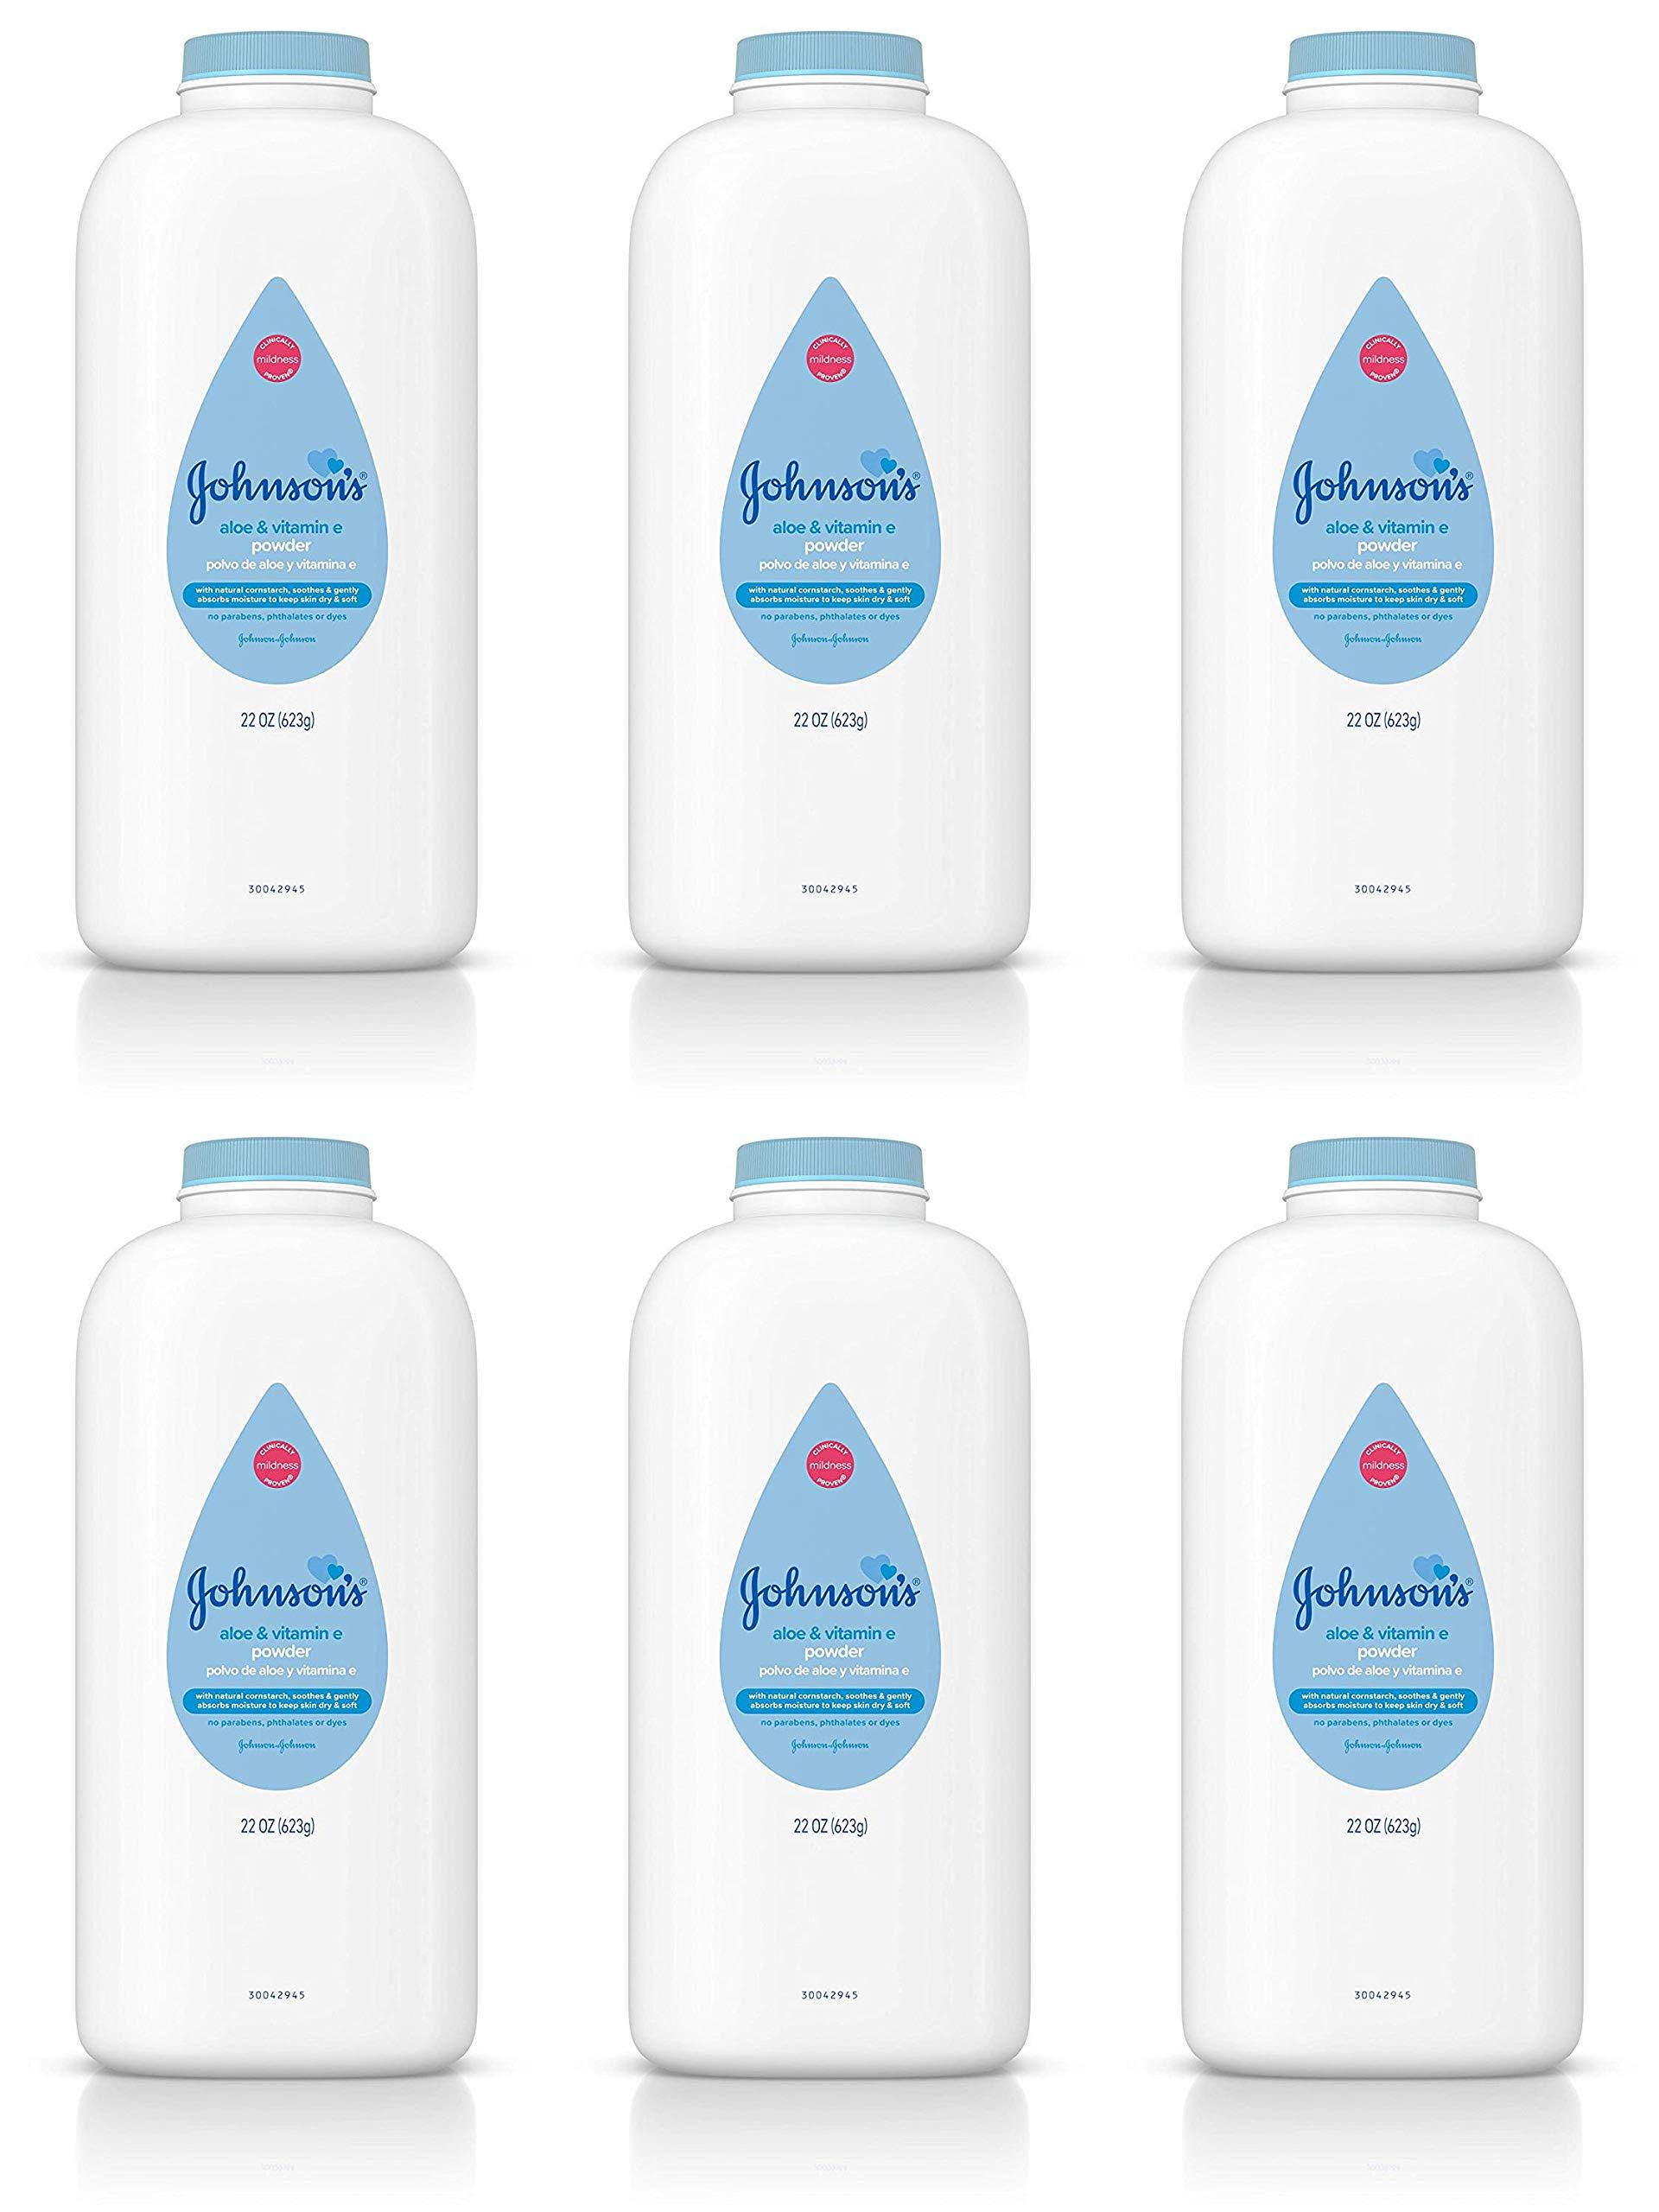 Johnson & Johnson Baby Powder with Aloe & Vitamin E Pure Cornstarch 22 oz. (Pack of 6) by Johnson & Johnson